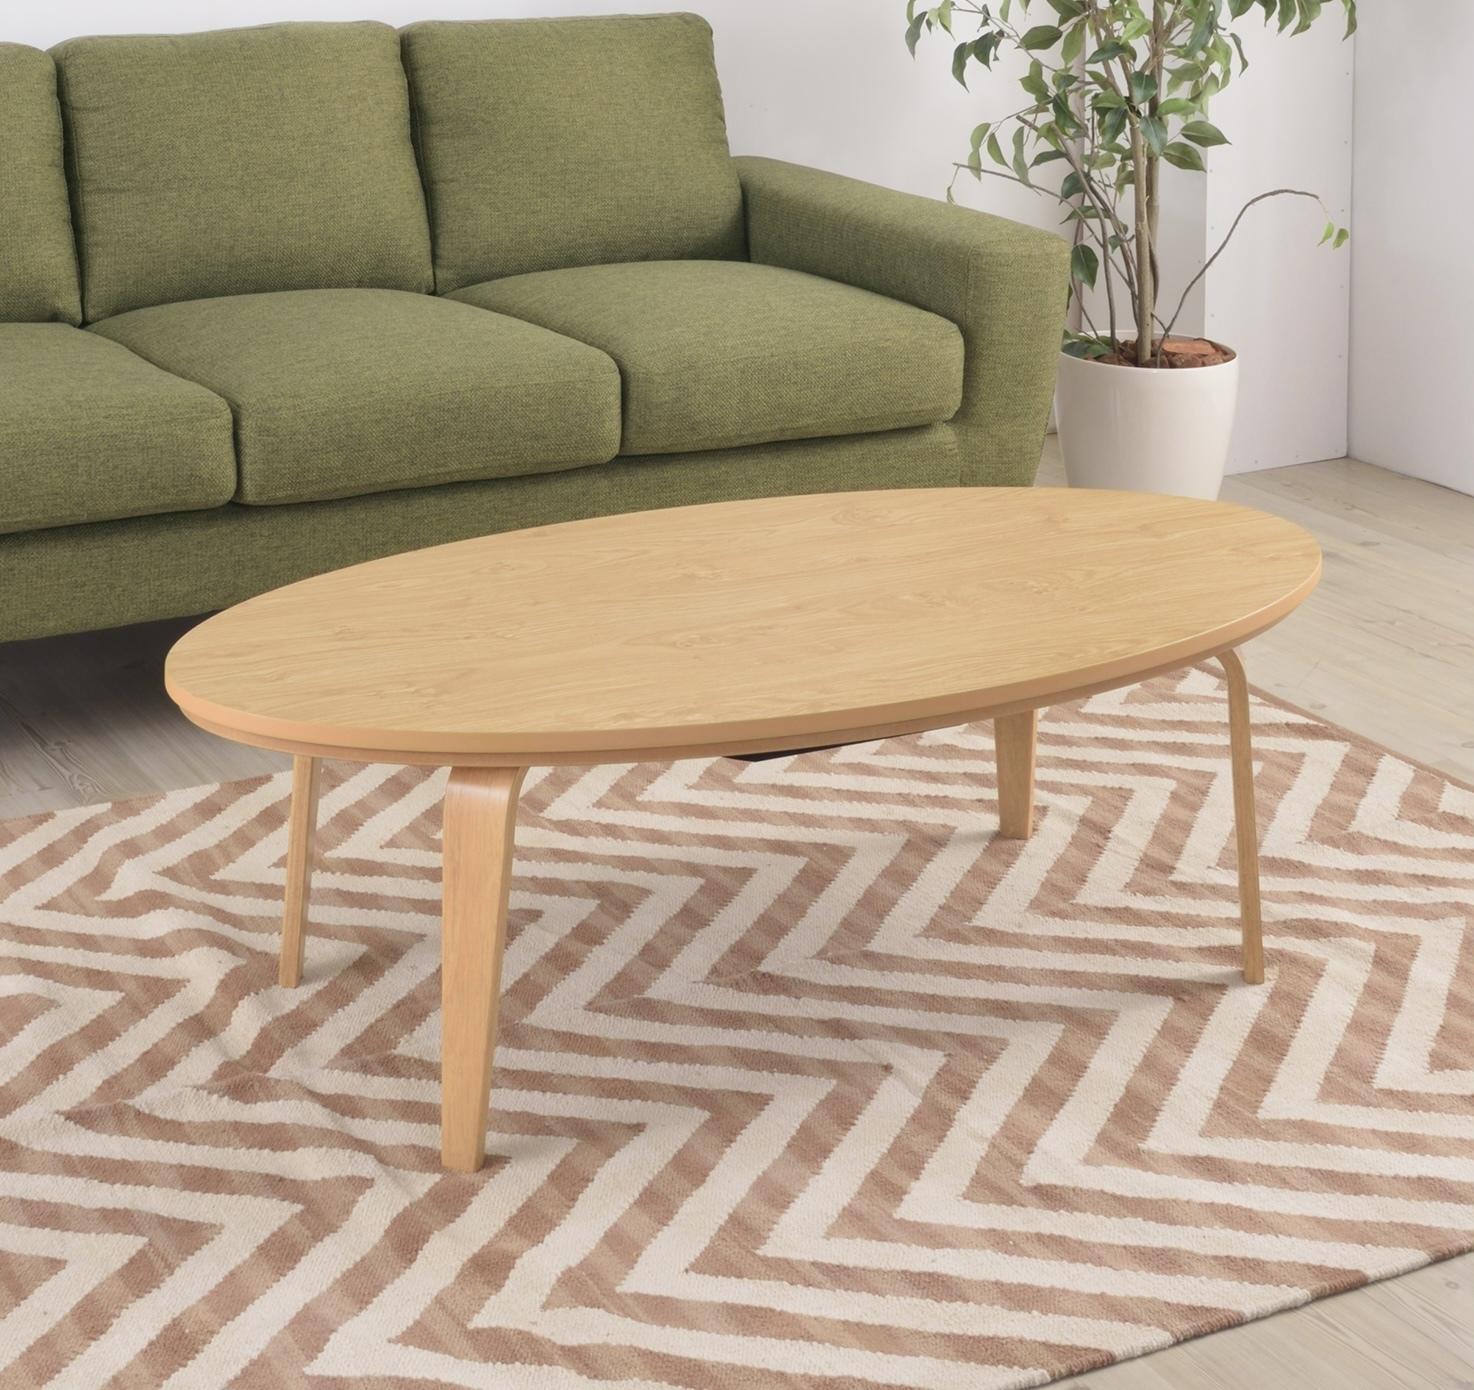 Natural Wood  KOTATSU Oval / コタツ センターテーブル 天然木風 カントリー